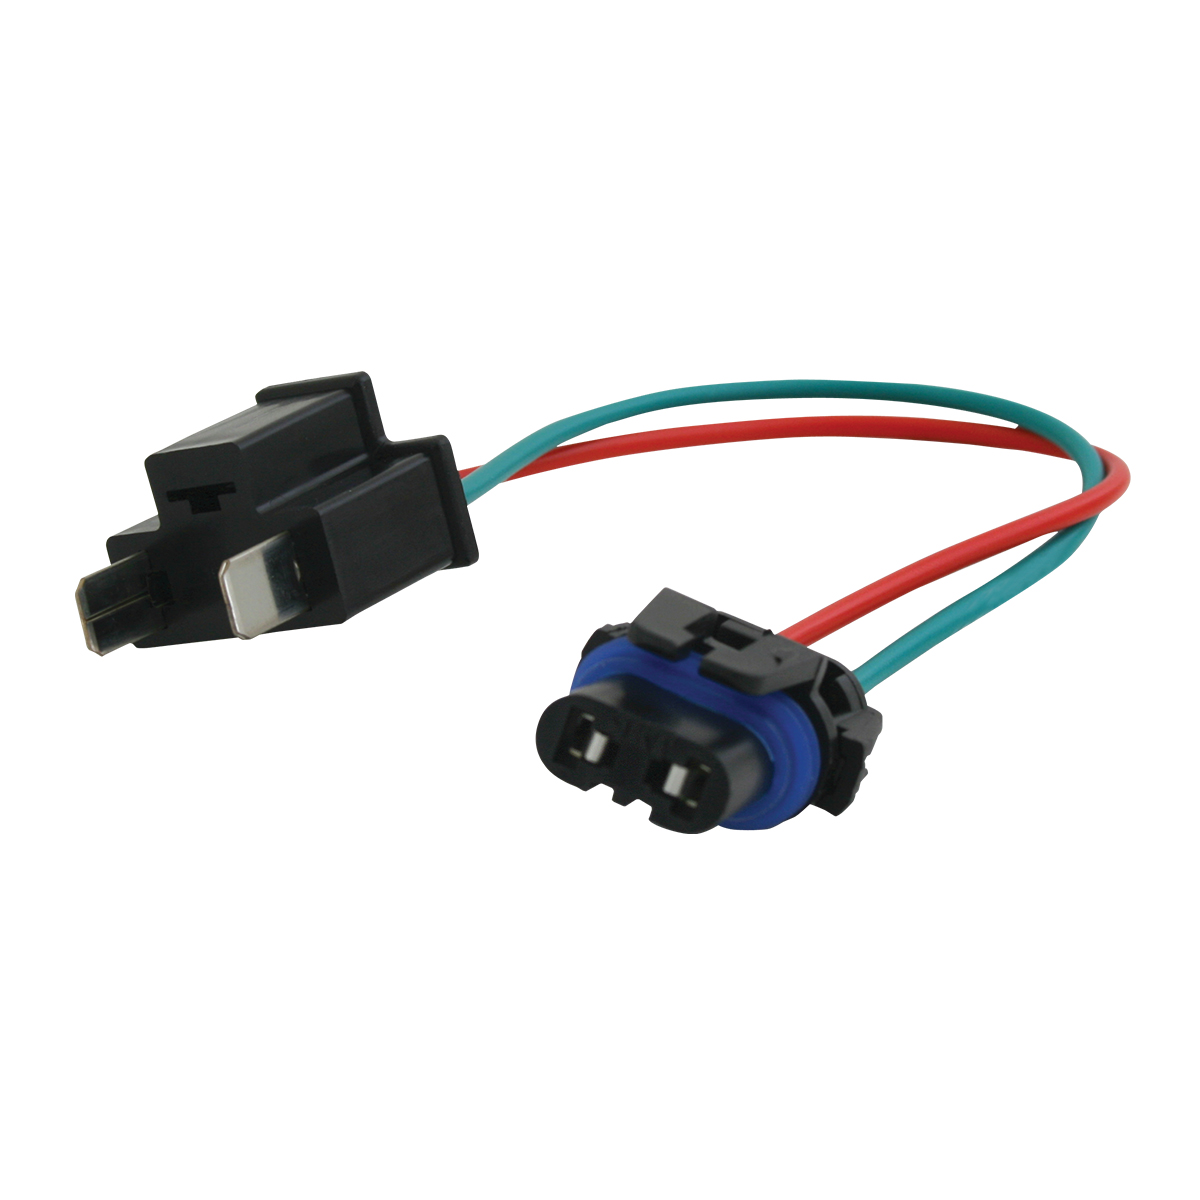 #87736 Standard Lens Replacement Plug